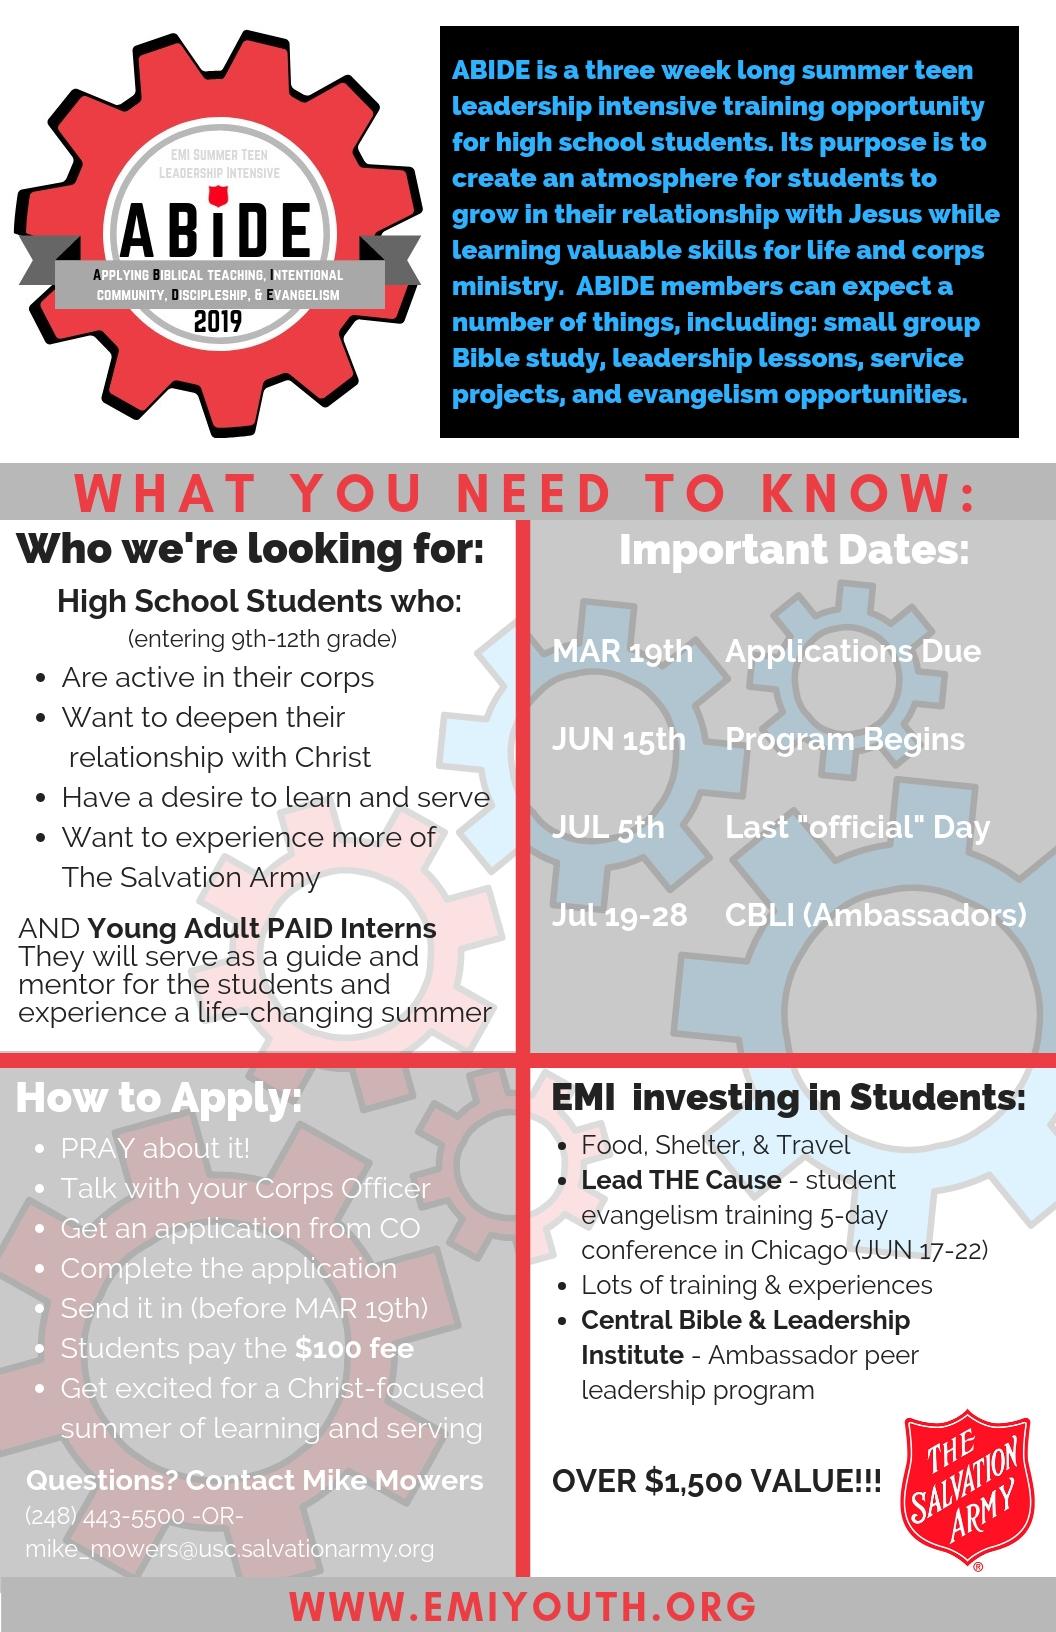 ABIDE - Eastern Michigan Youth Programs